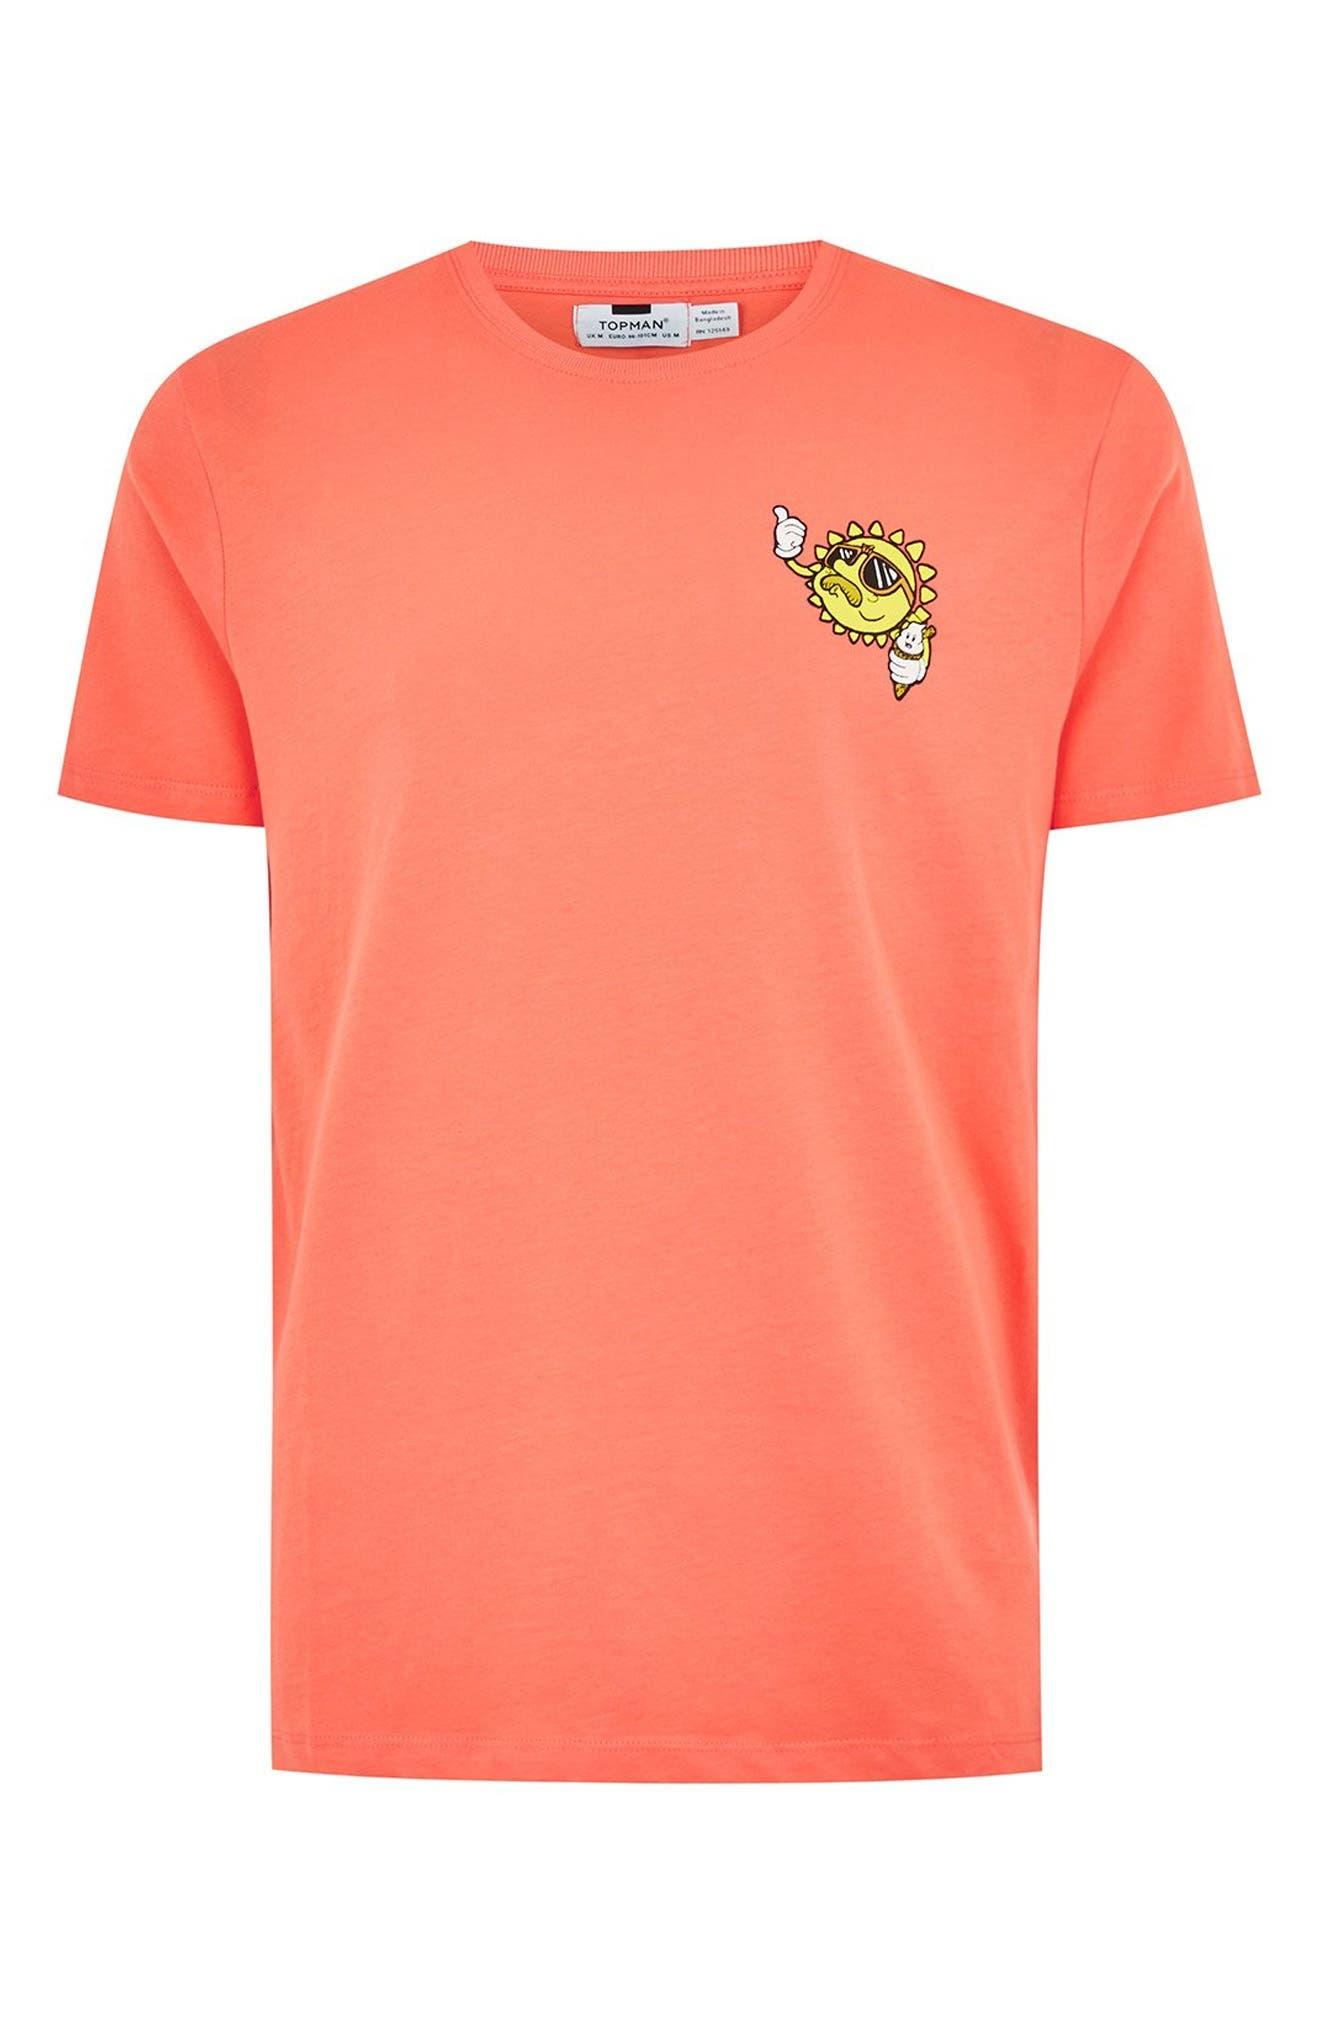 Sun T-Shirt,                             Alternate thumbnail 4, color,                             PINK